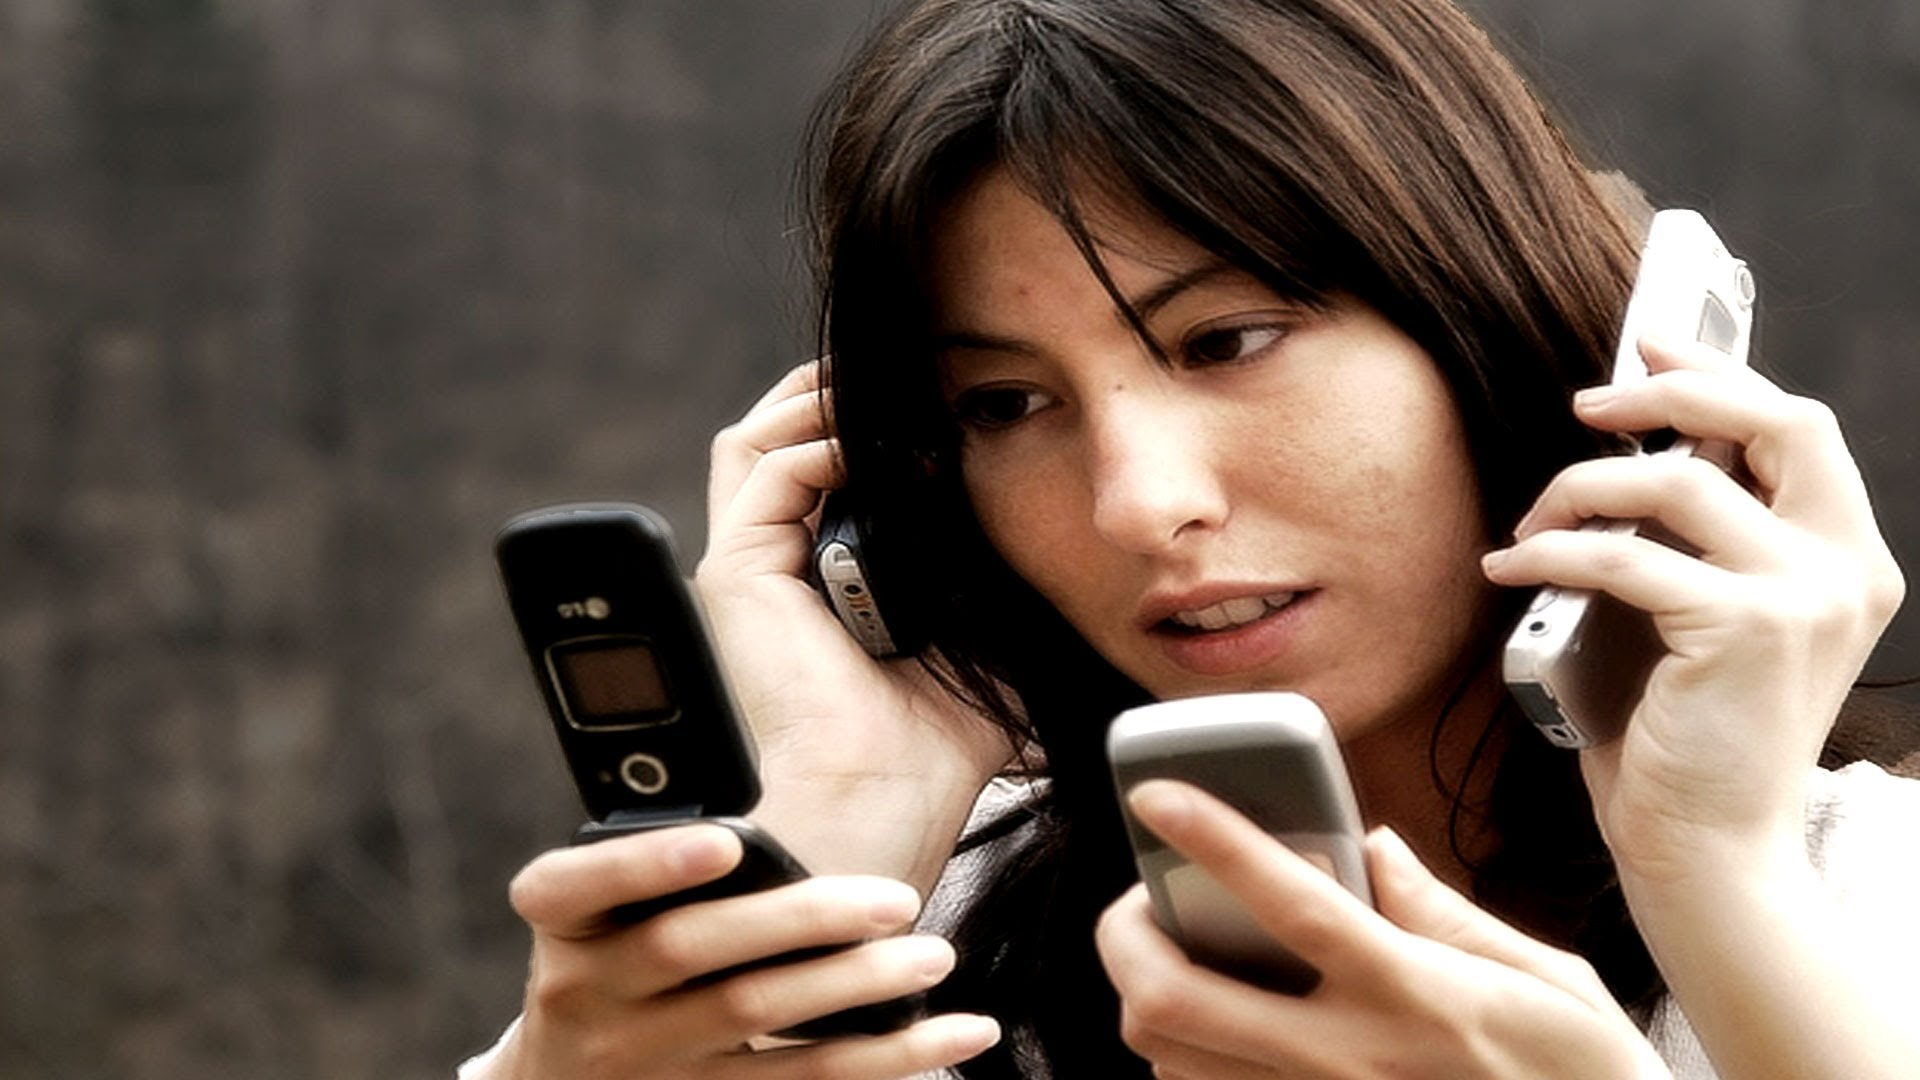 telefon-bagimlisi